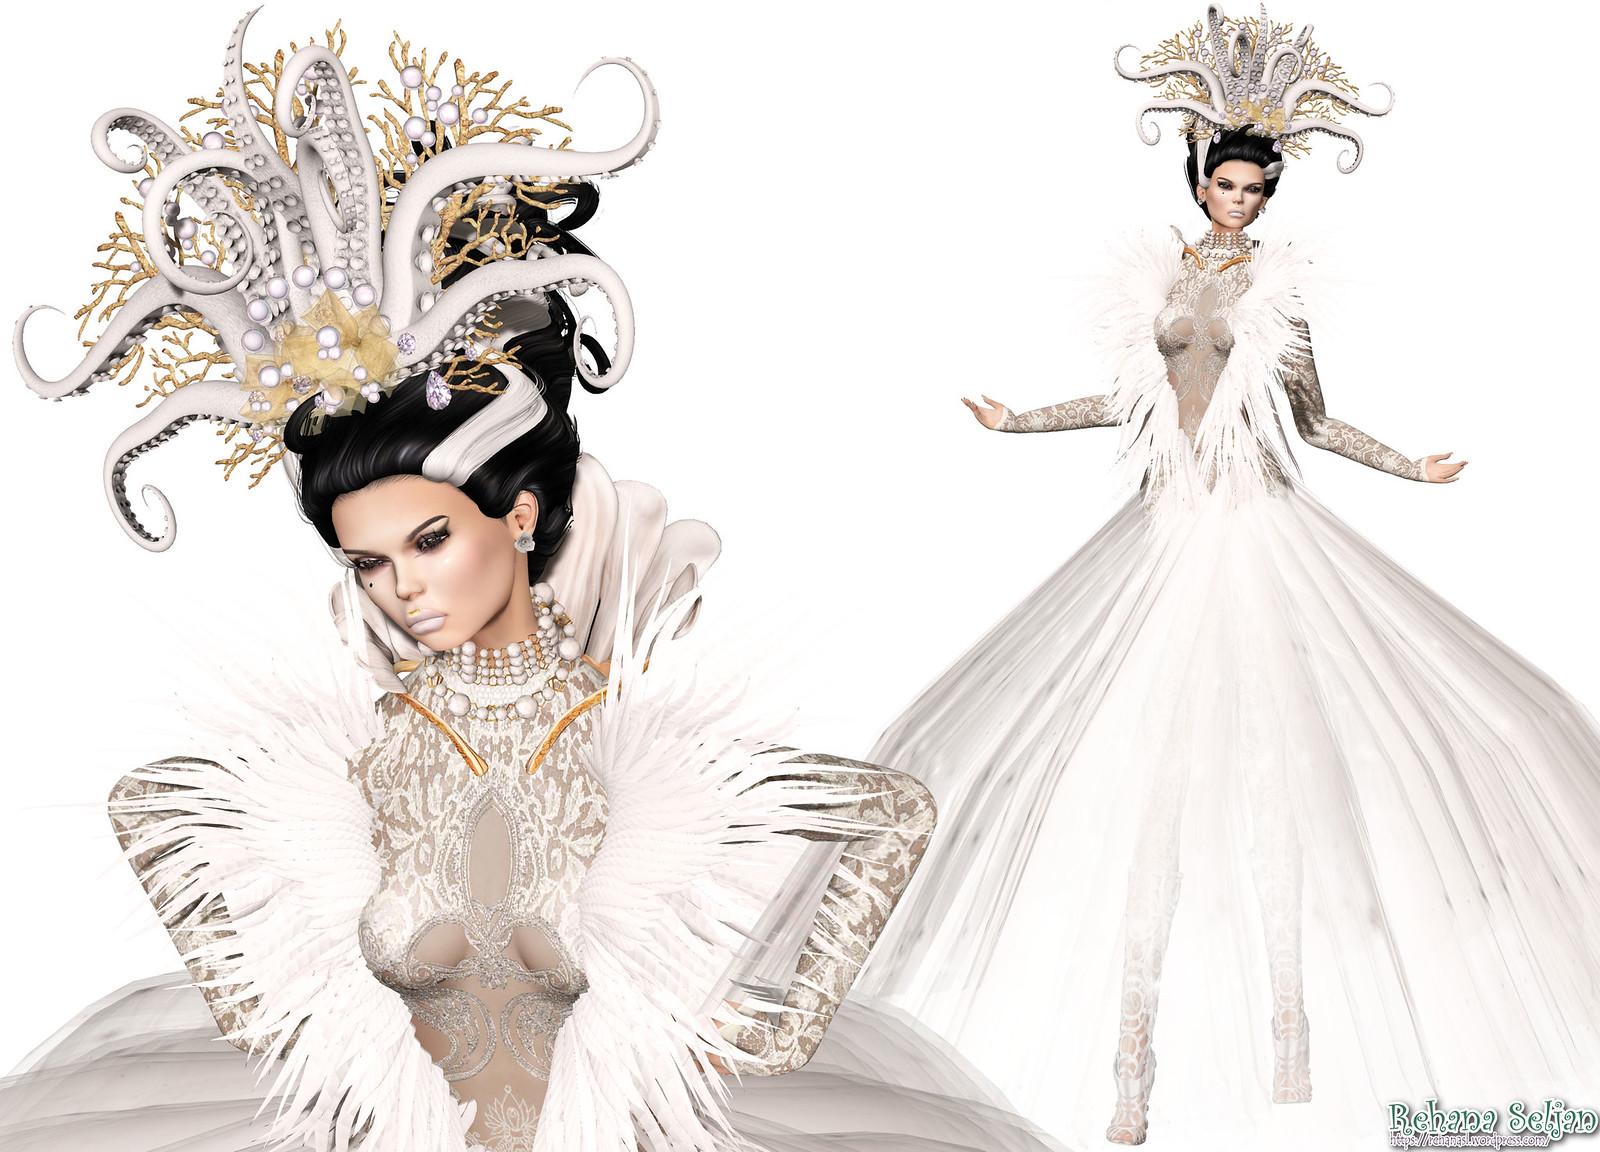 The Divine Fashion Show